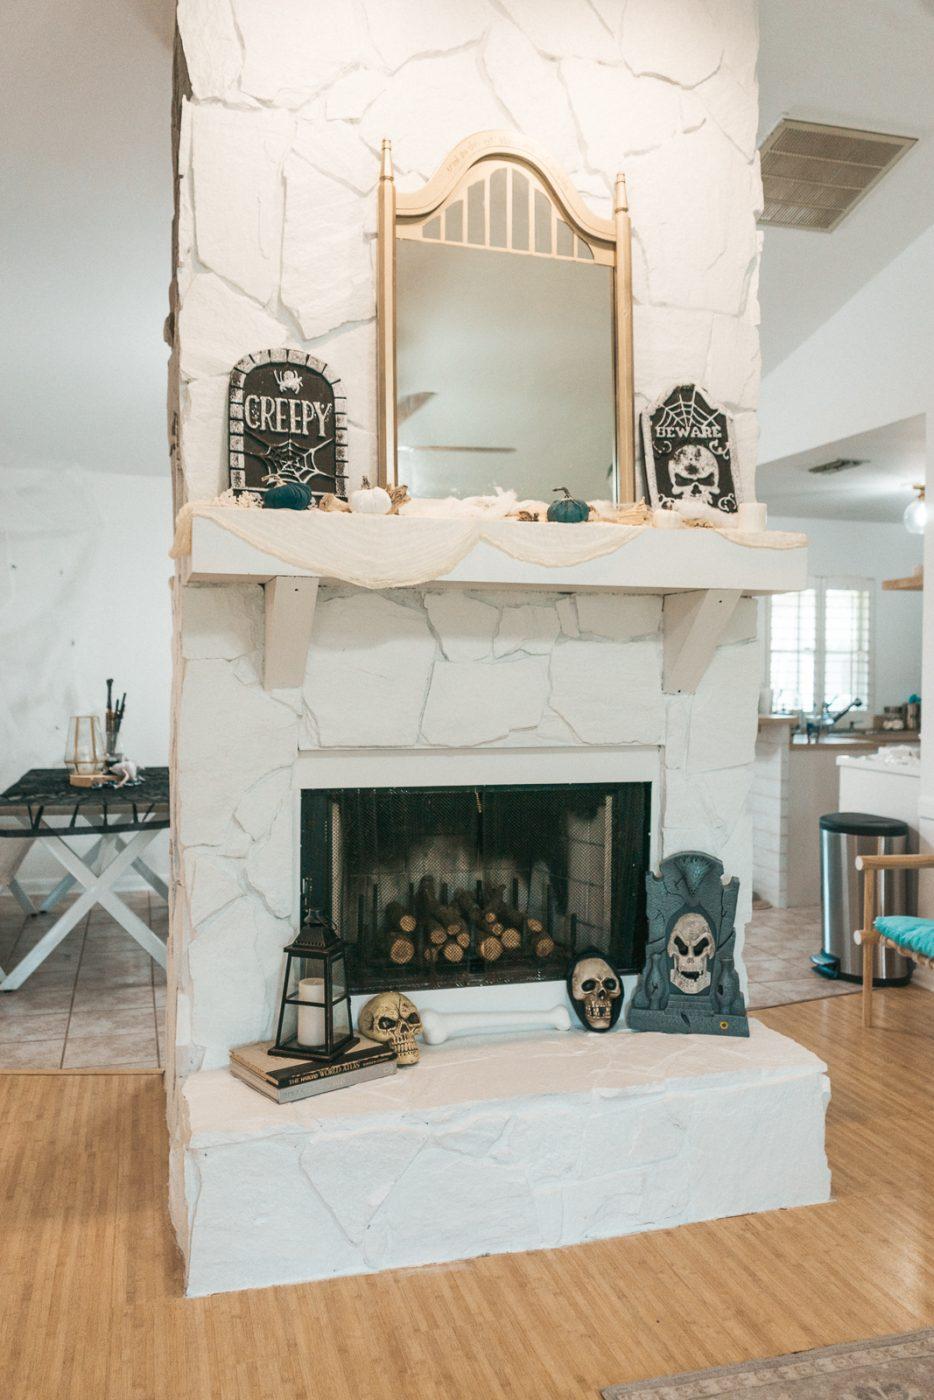 Harry Potter Fireplace Decorations